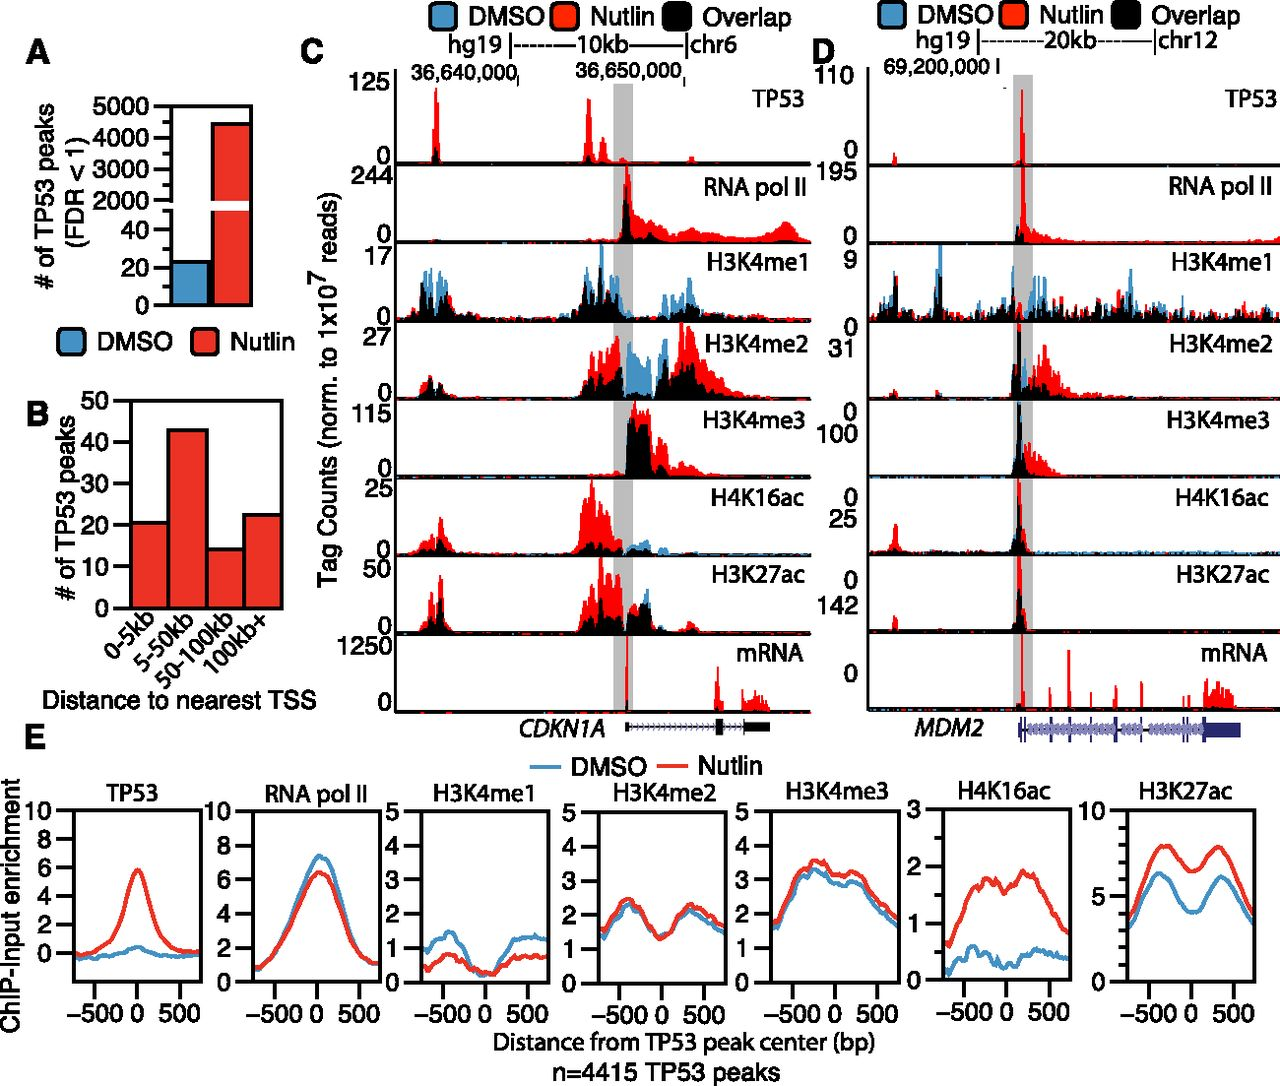 Epigenomic analysis of TP53 activation in primary human fibroblasts